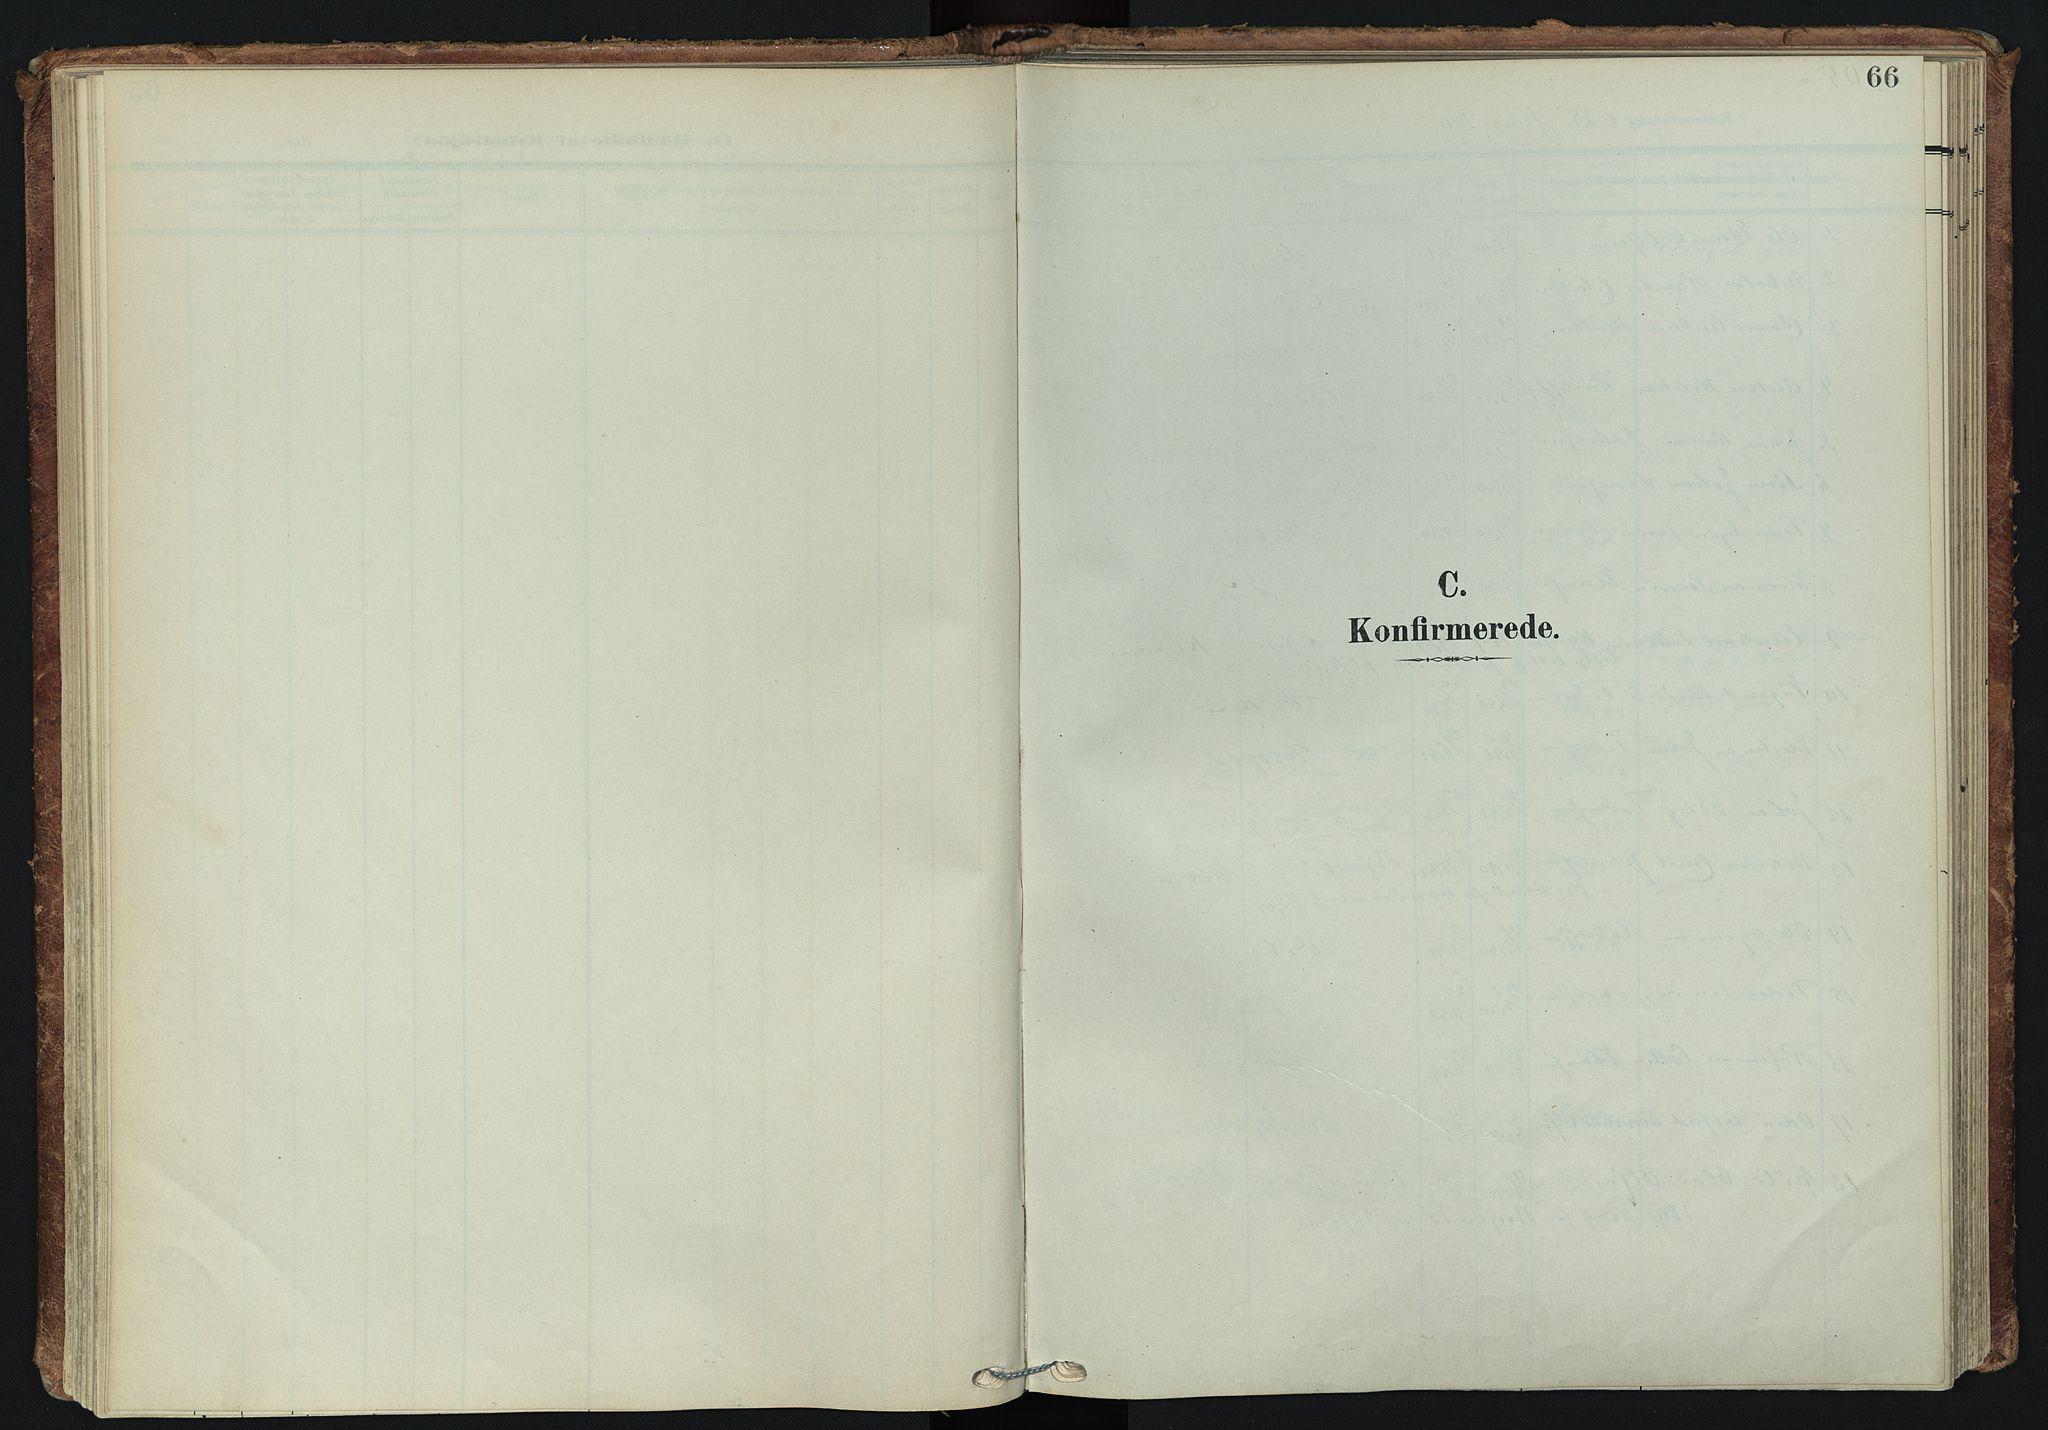 SATØ, Tranøy sokneprestkontor, I/Ia/Iaa/L0014kirke: Ministerialbok nr. 14, 1905-1919, s. 66